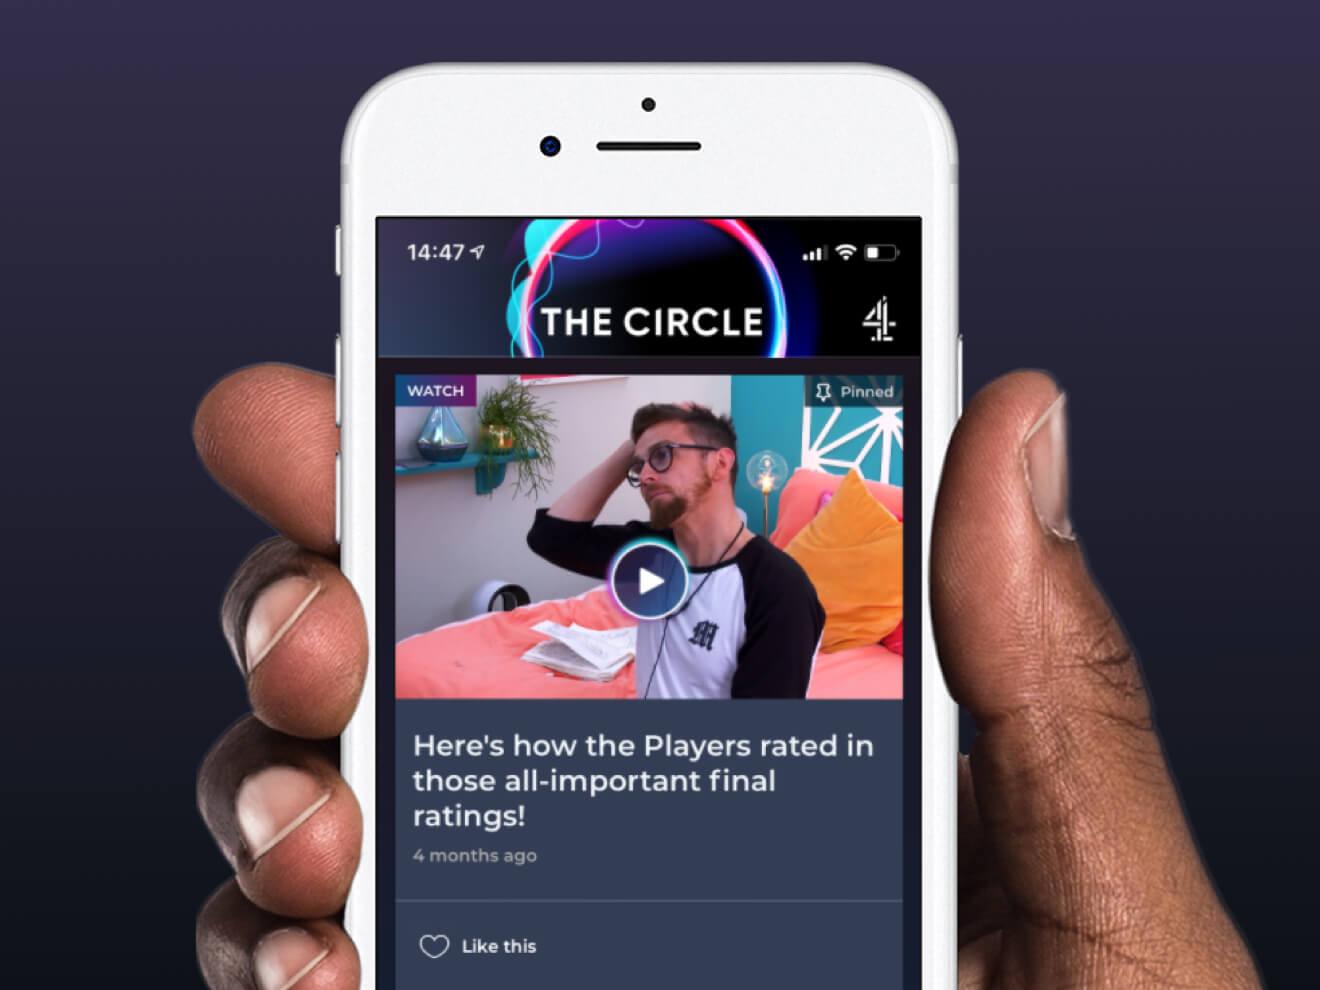 The Circle App